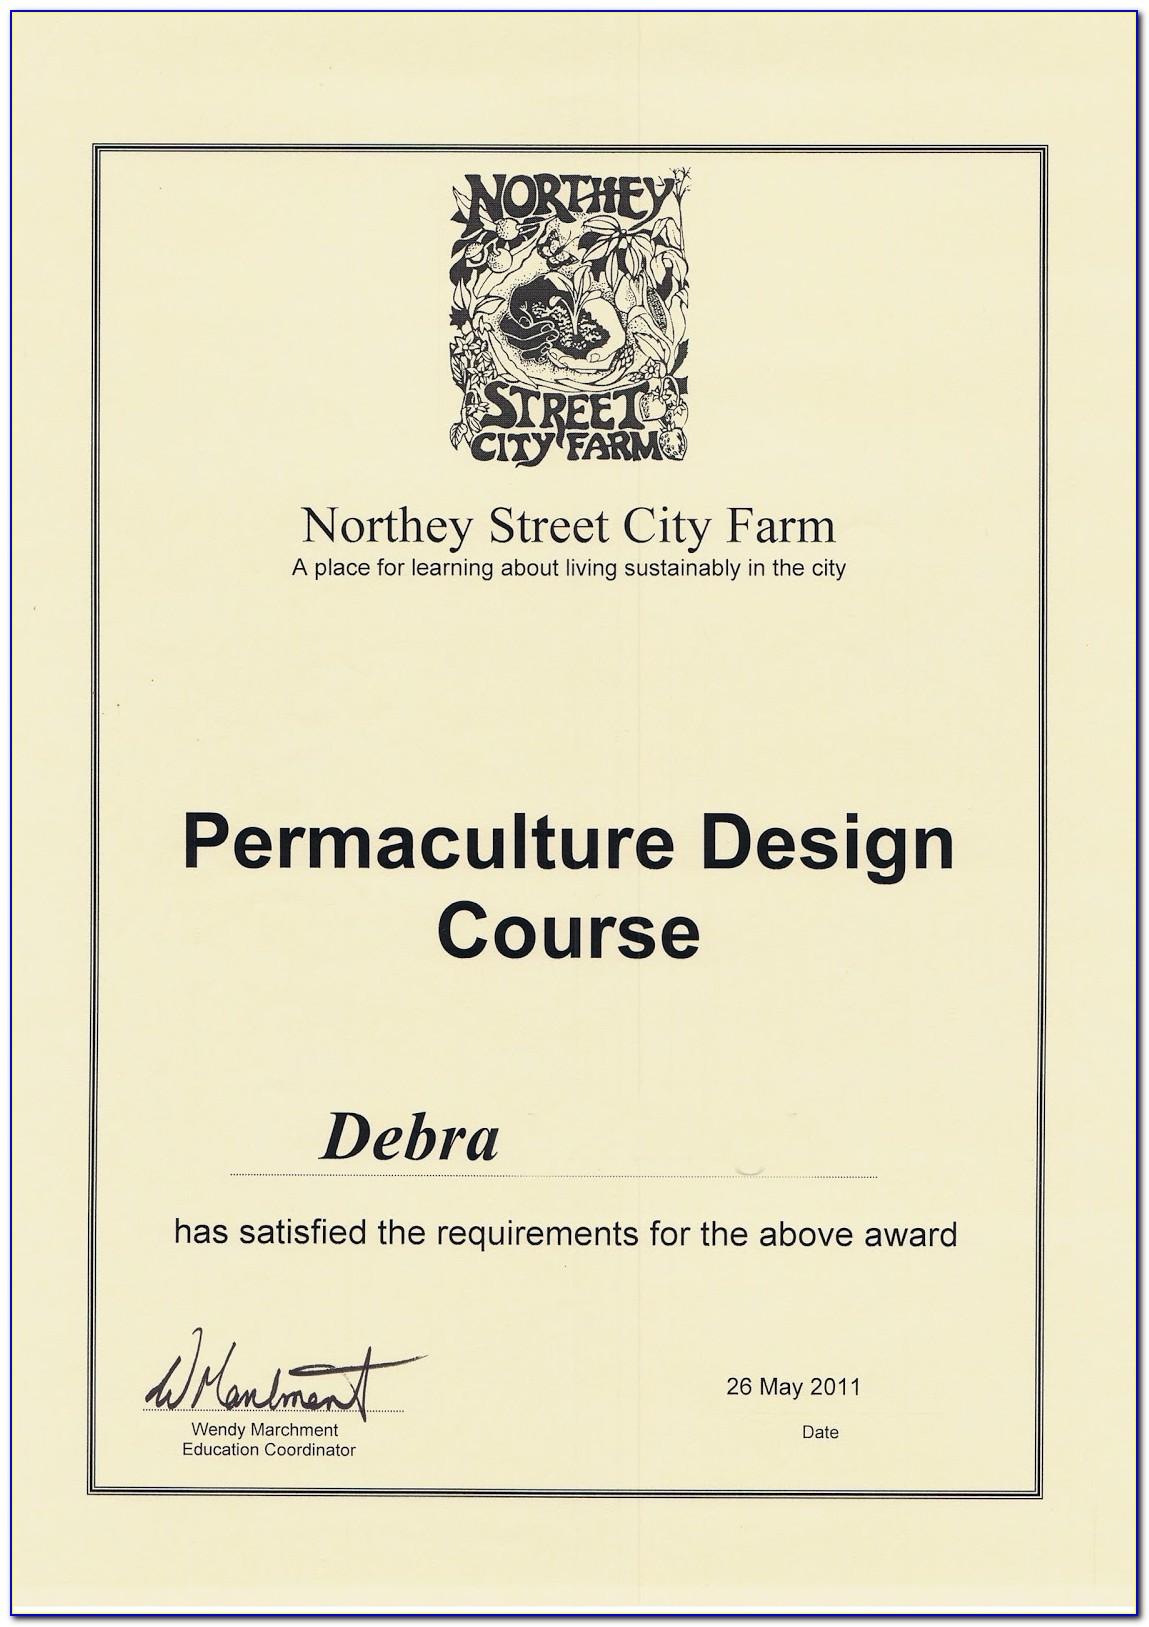 Permaculture Design Certificate Nz